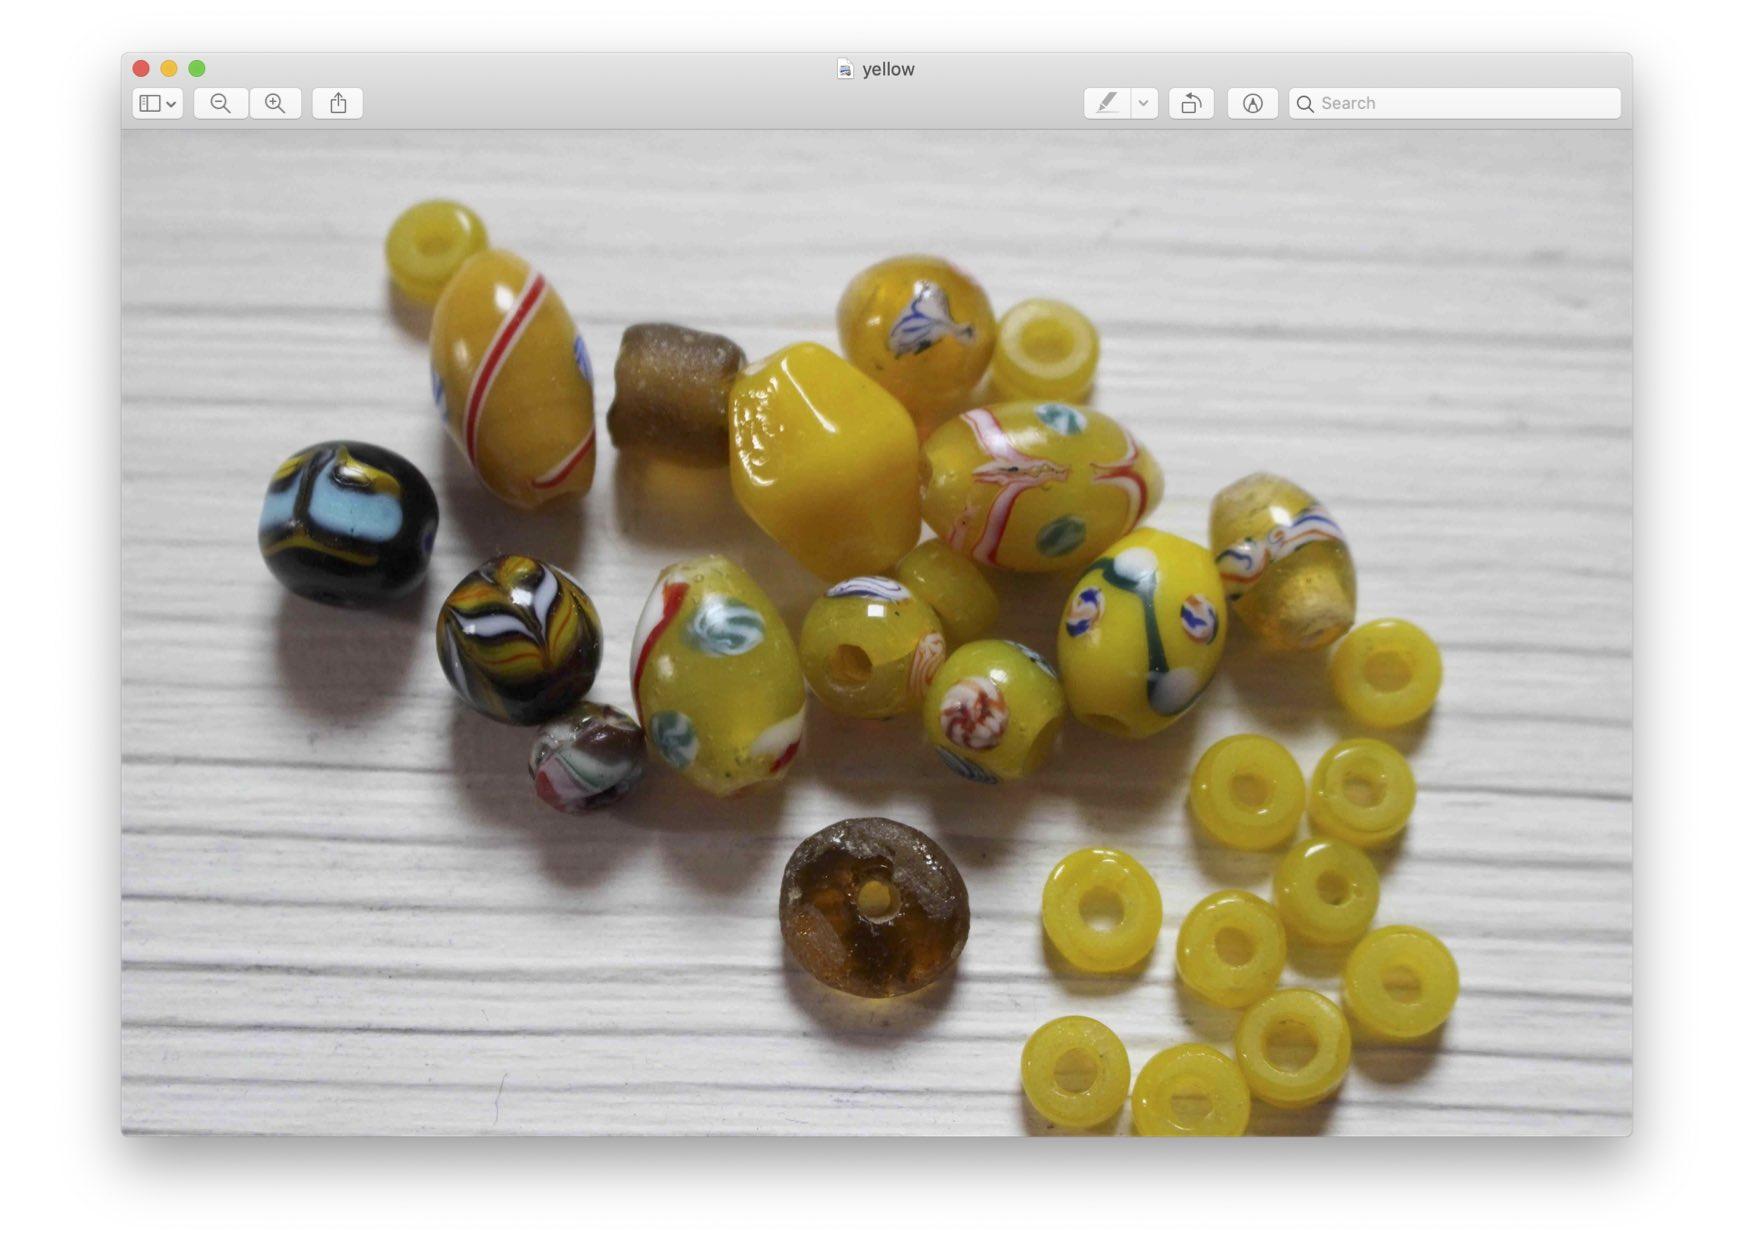 yellowbeads.jpg (169.8 KB)